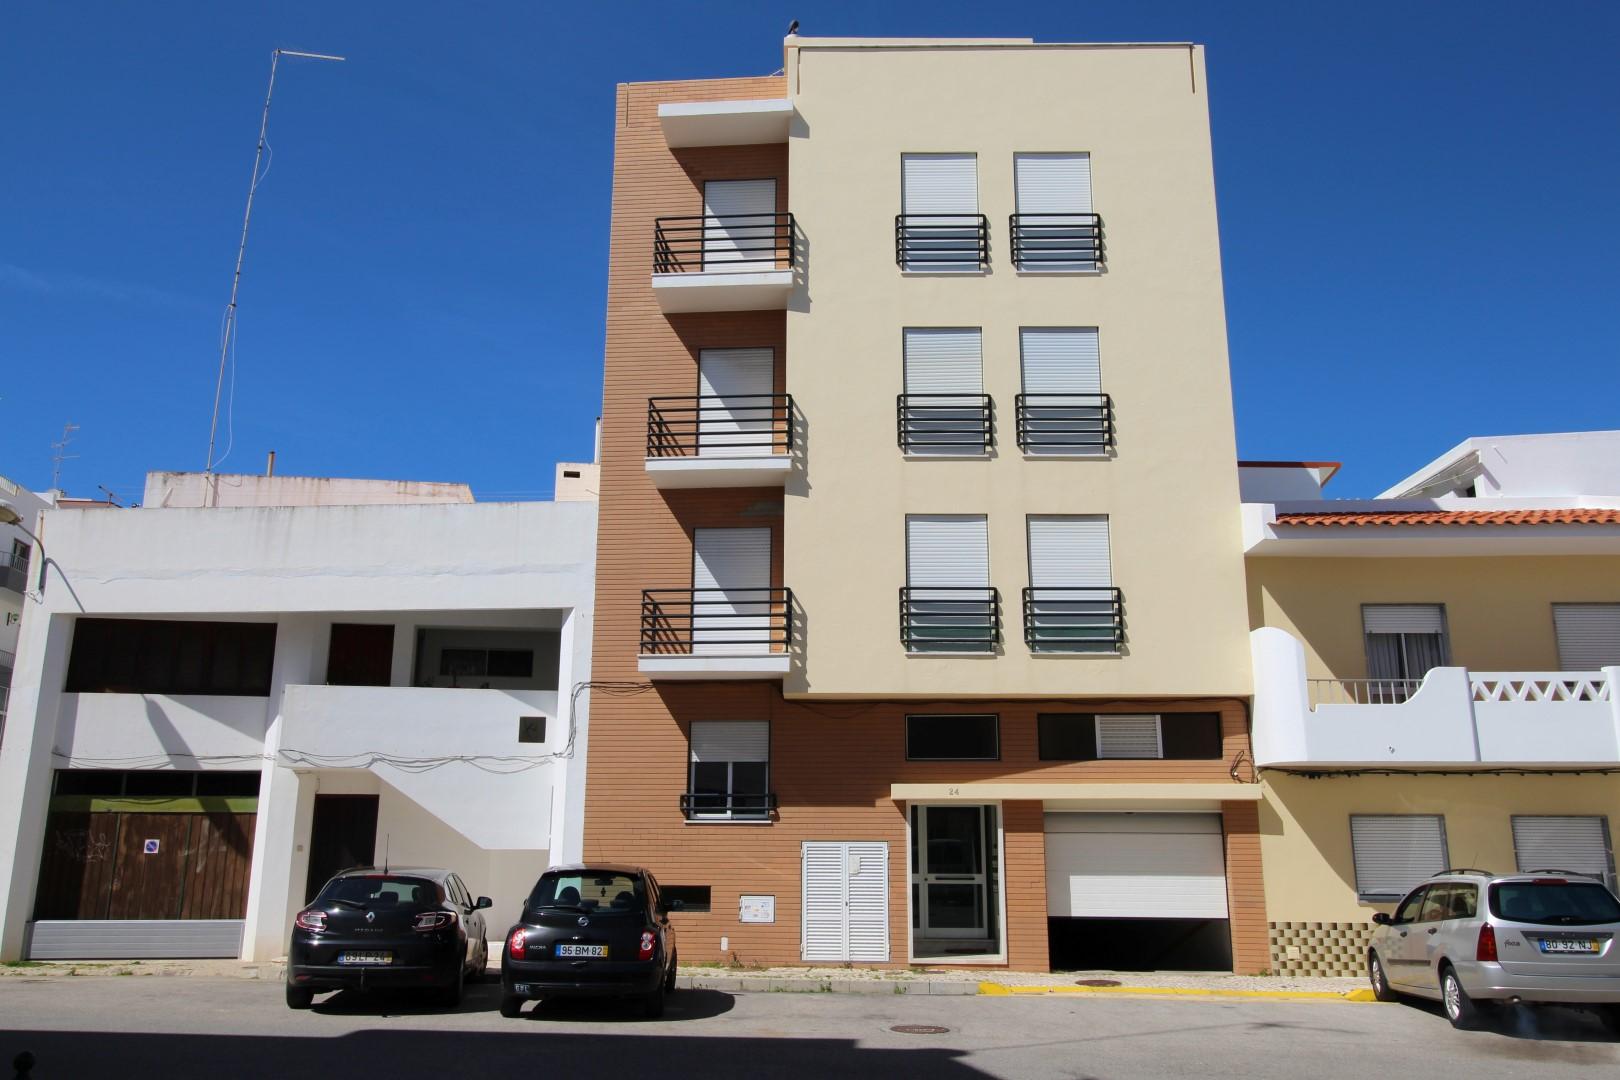 Location appartements et villas de vacance, Appartement 350m de la plage – Armação-de-Pêra à Armação de Pêra, Portugal Algarve, REF_IMG_6867_8701